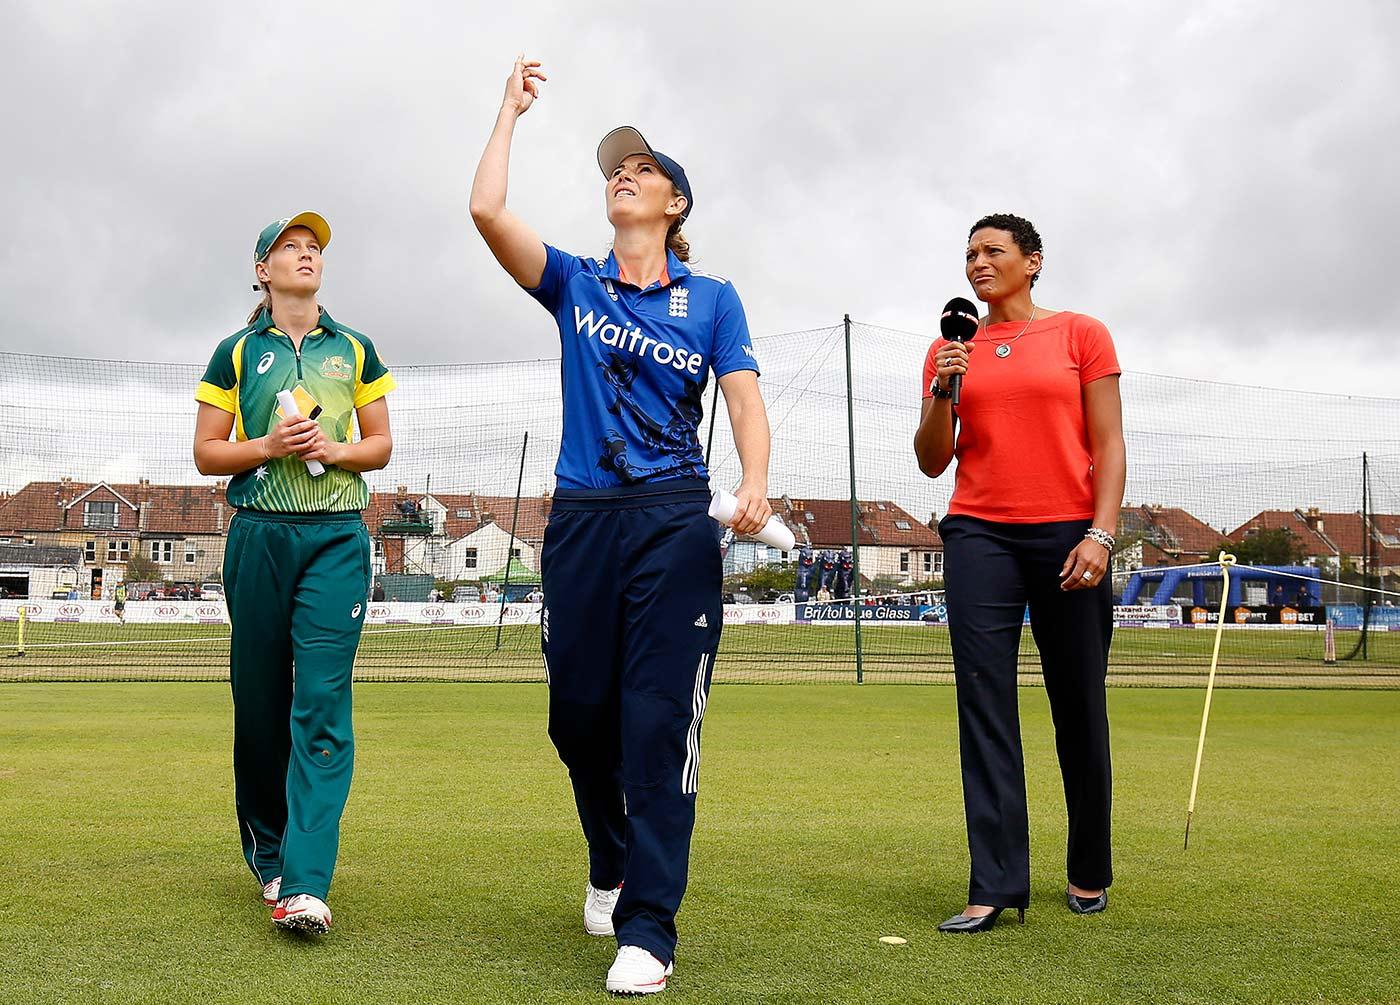 Charlotte Edwards, Meg Lanning and Melanie Jones at the toss